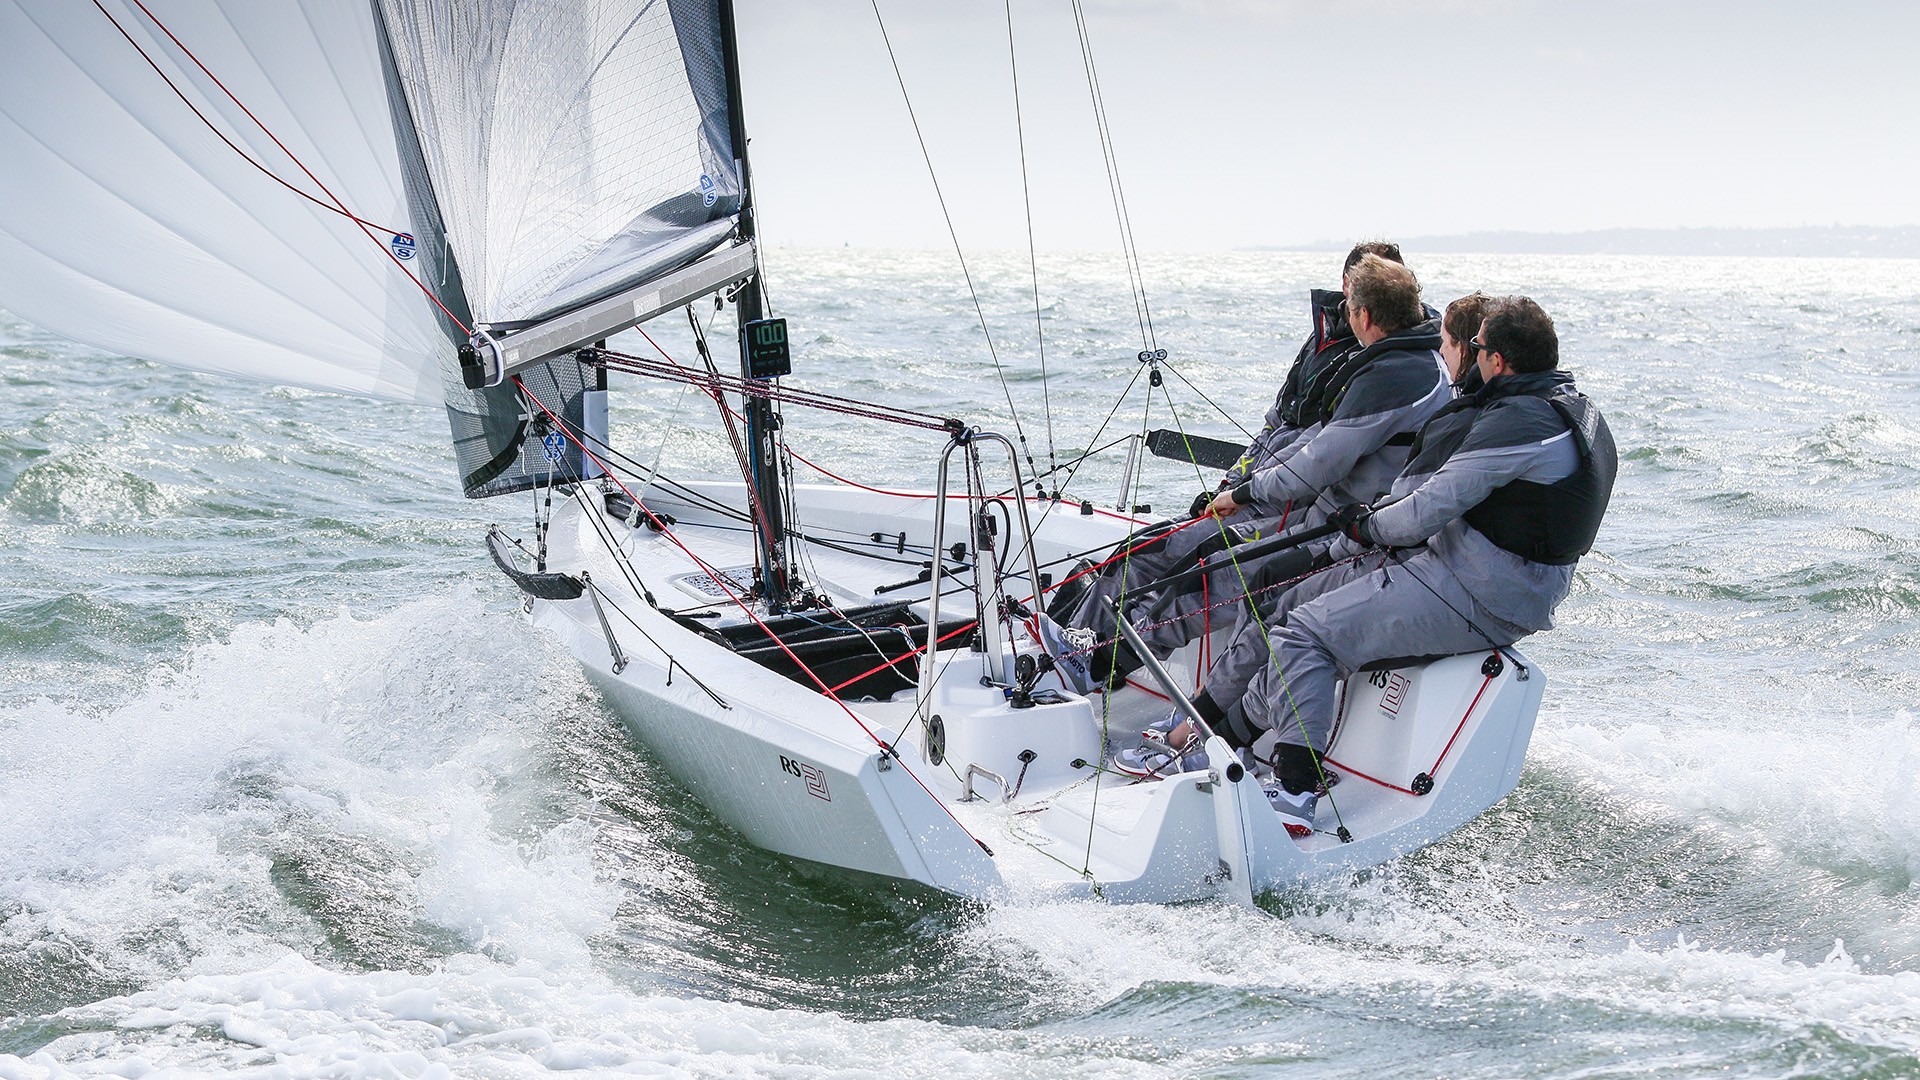 RS 21 Central Coast Sailing 3.jpg